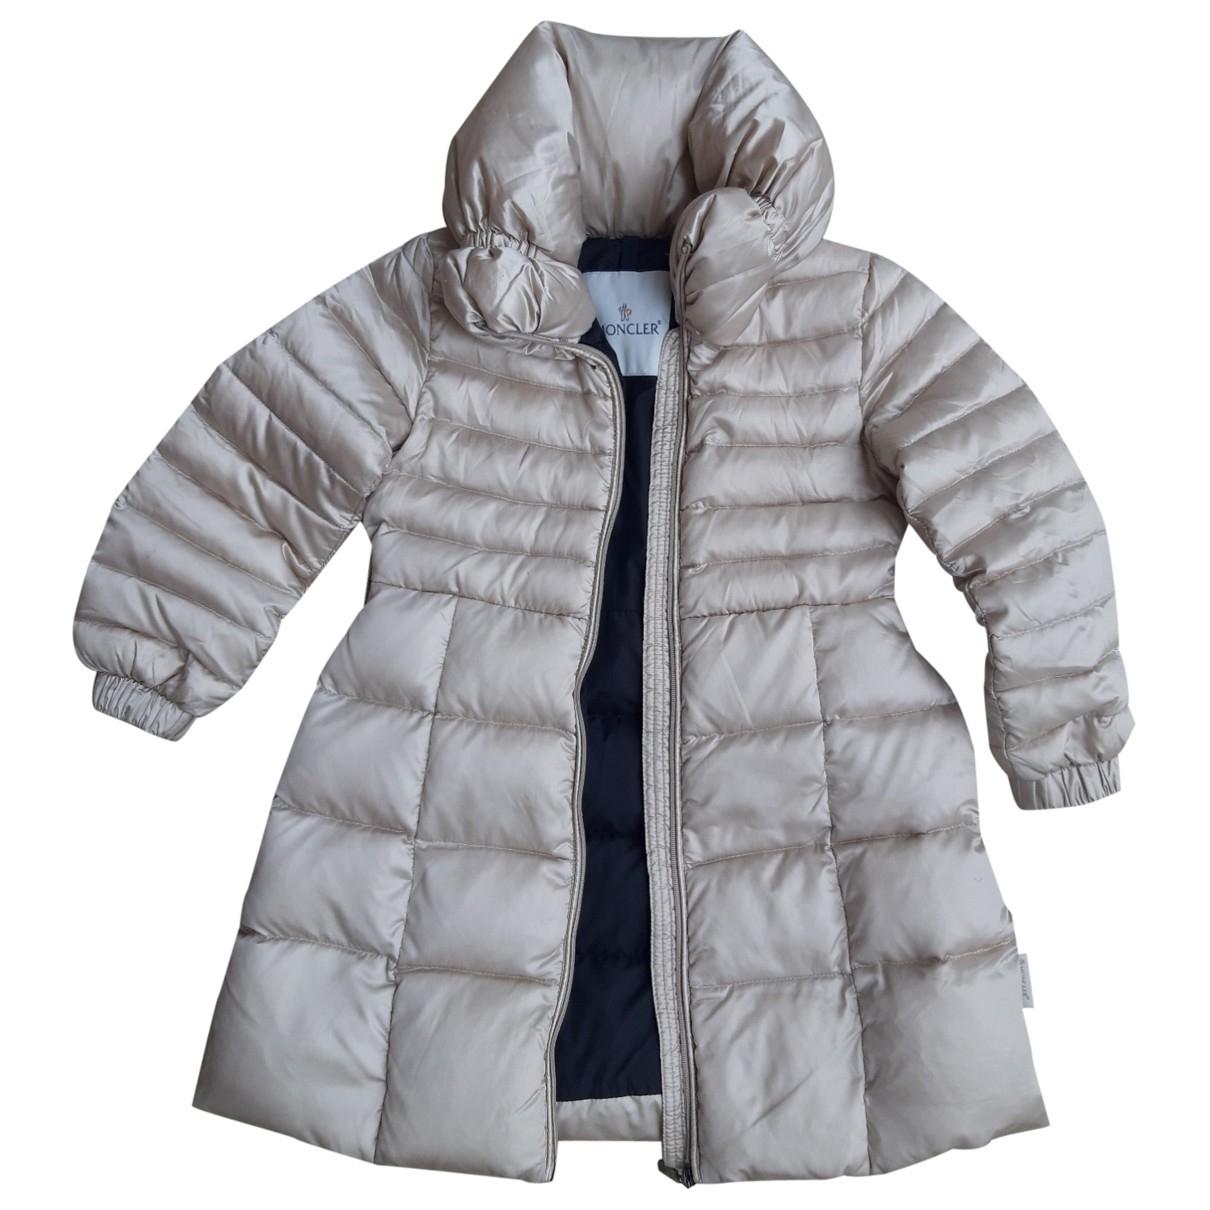 Moncler \N Beige jacket & coat for Kids 4 years - up to 102cm FR